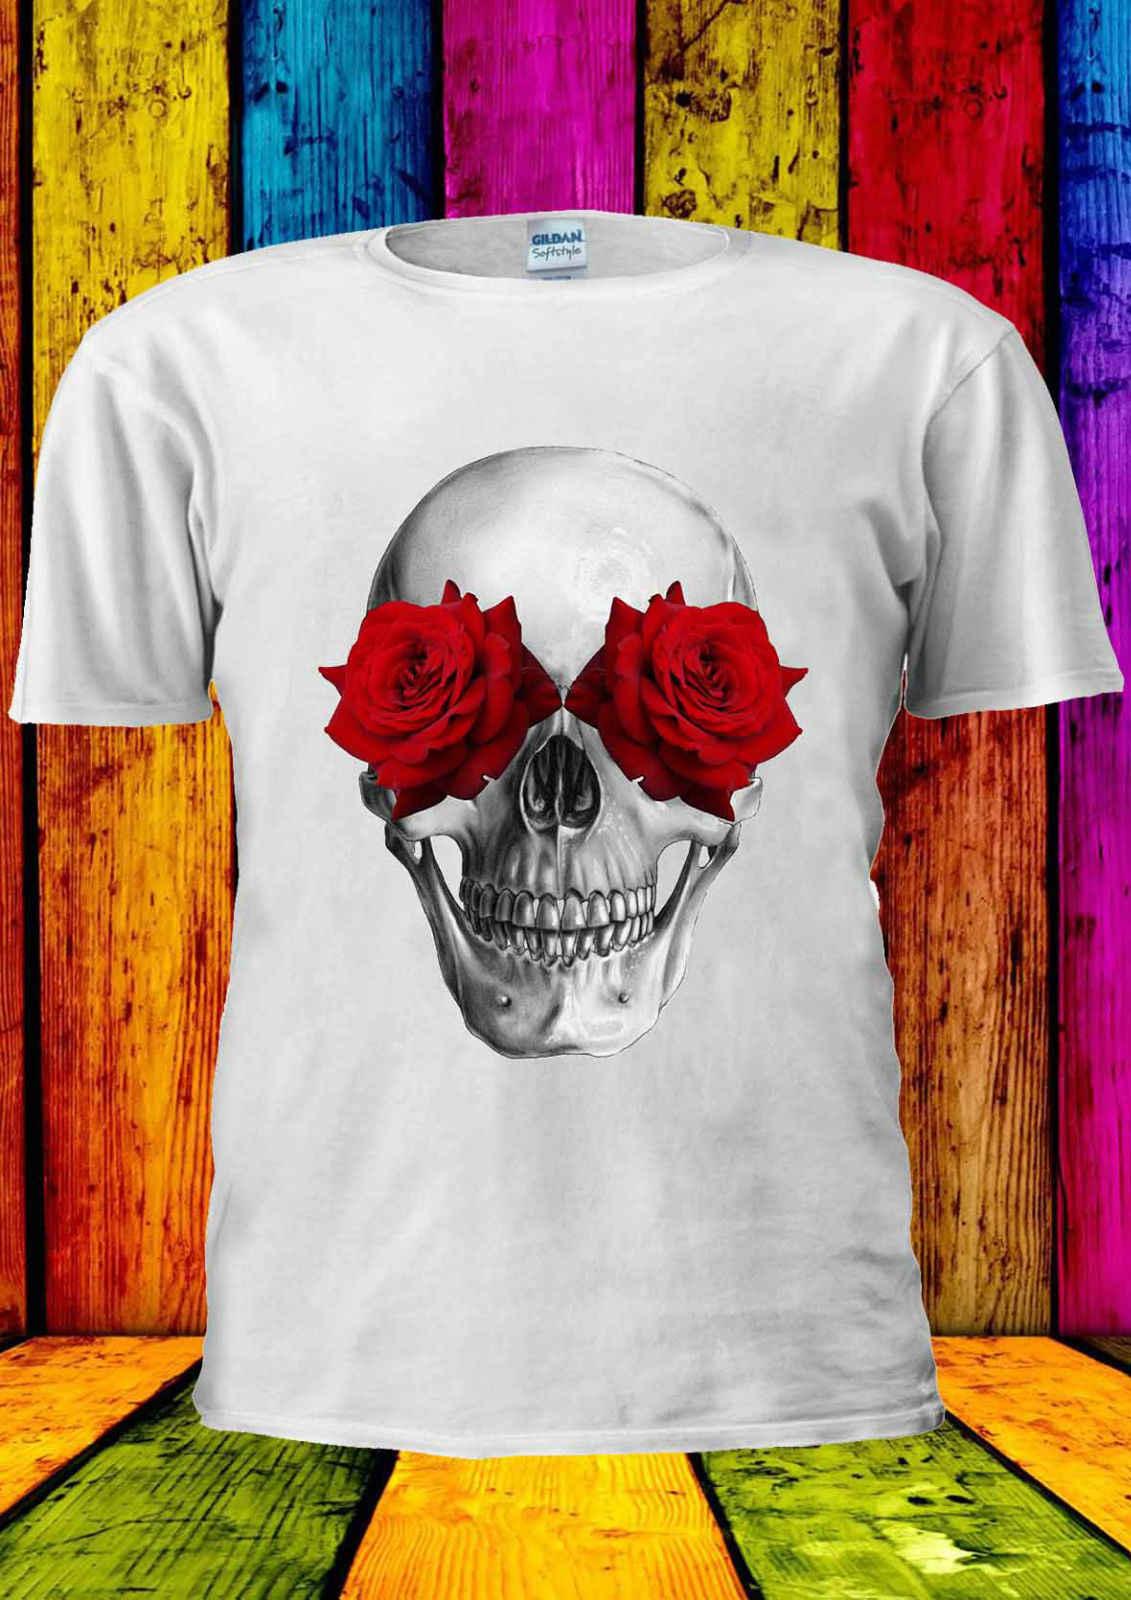 Red Roses And SKULL SUMMER FESTIVAL T-shirt Vest  Men Women Unisex 1752 summer o neck tee, free shipping cheap tee